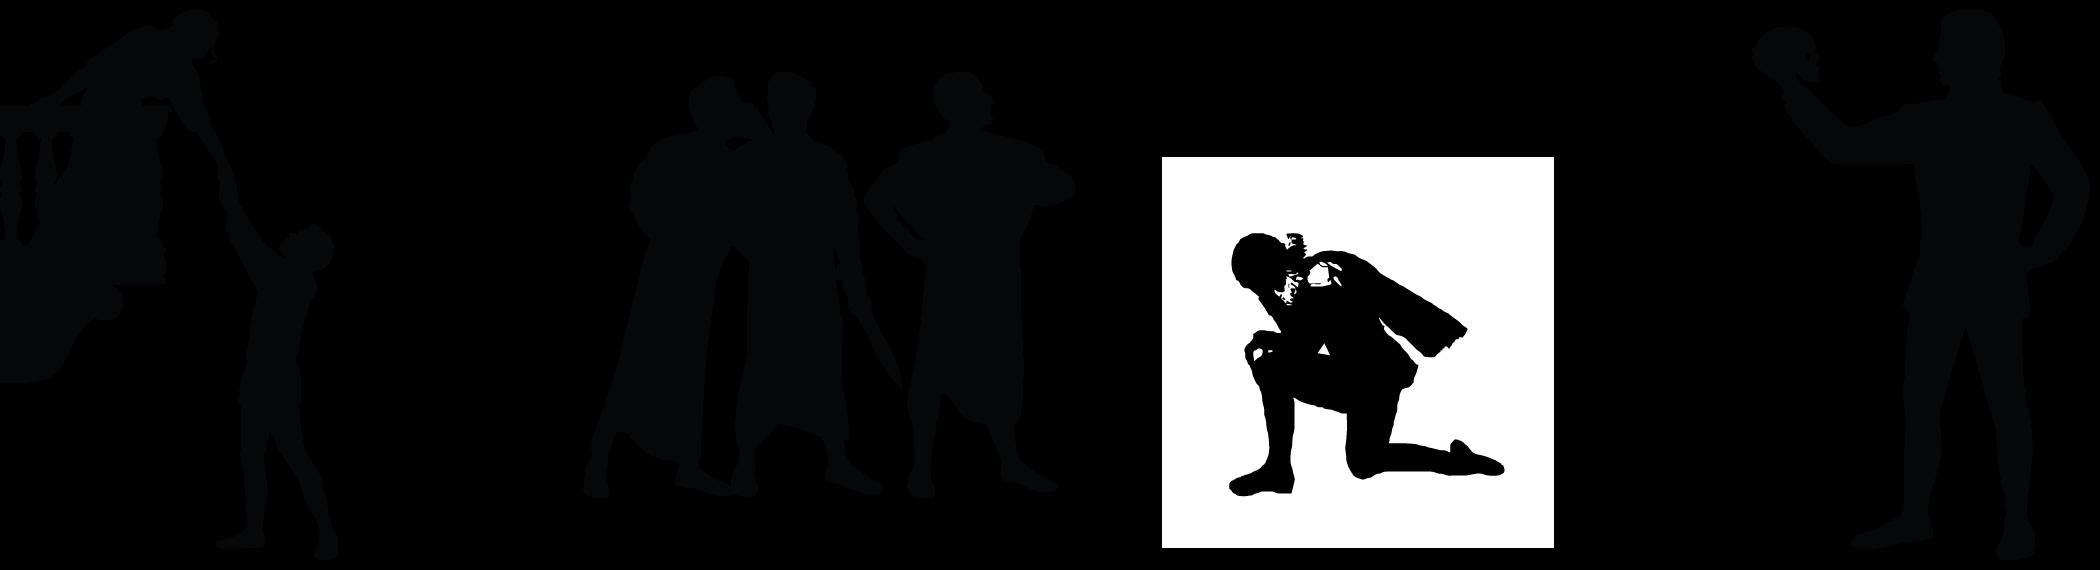 macbeth vs romeo and juliet Good vs evil romeo and juliet  to afrikaans essay essay good vs evil from glee romeo and juliet act macbeth essay ipb jeep essays epekto ng droga sa kabataan.